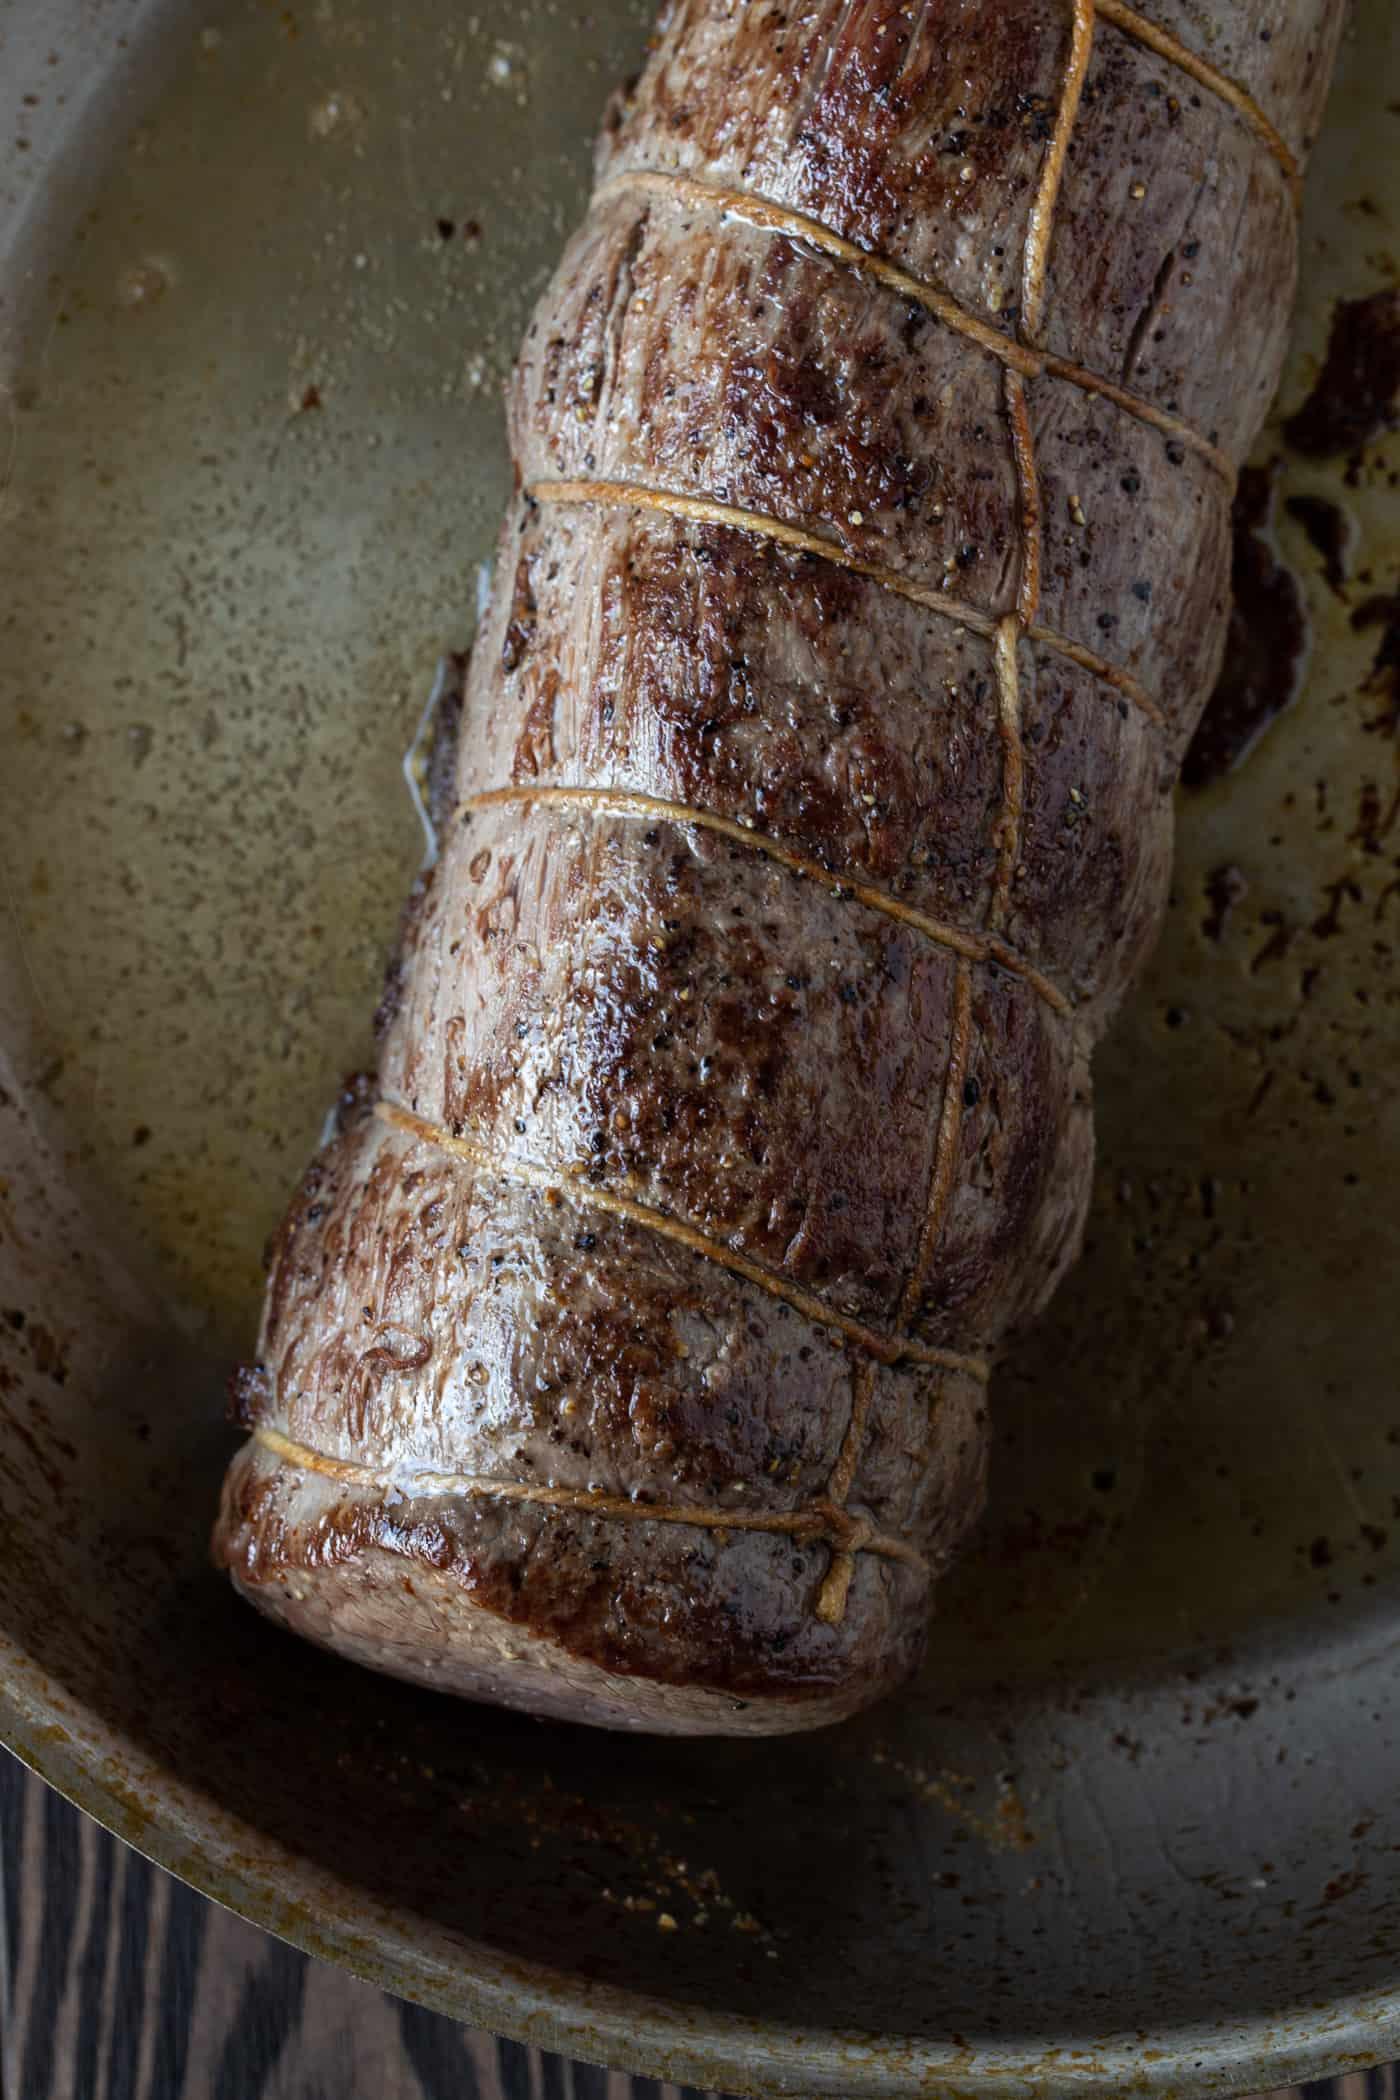 Uncut roasted beef tenderloin in skillet.